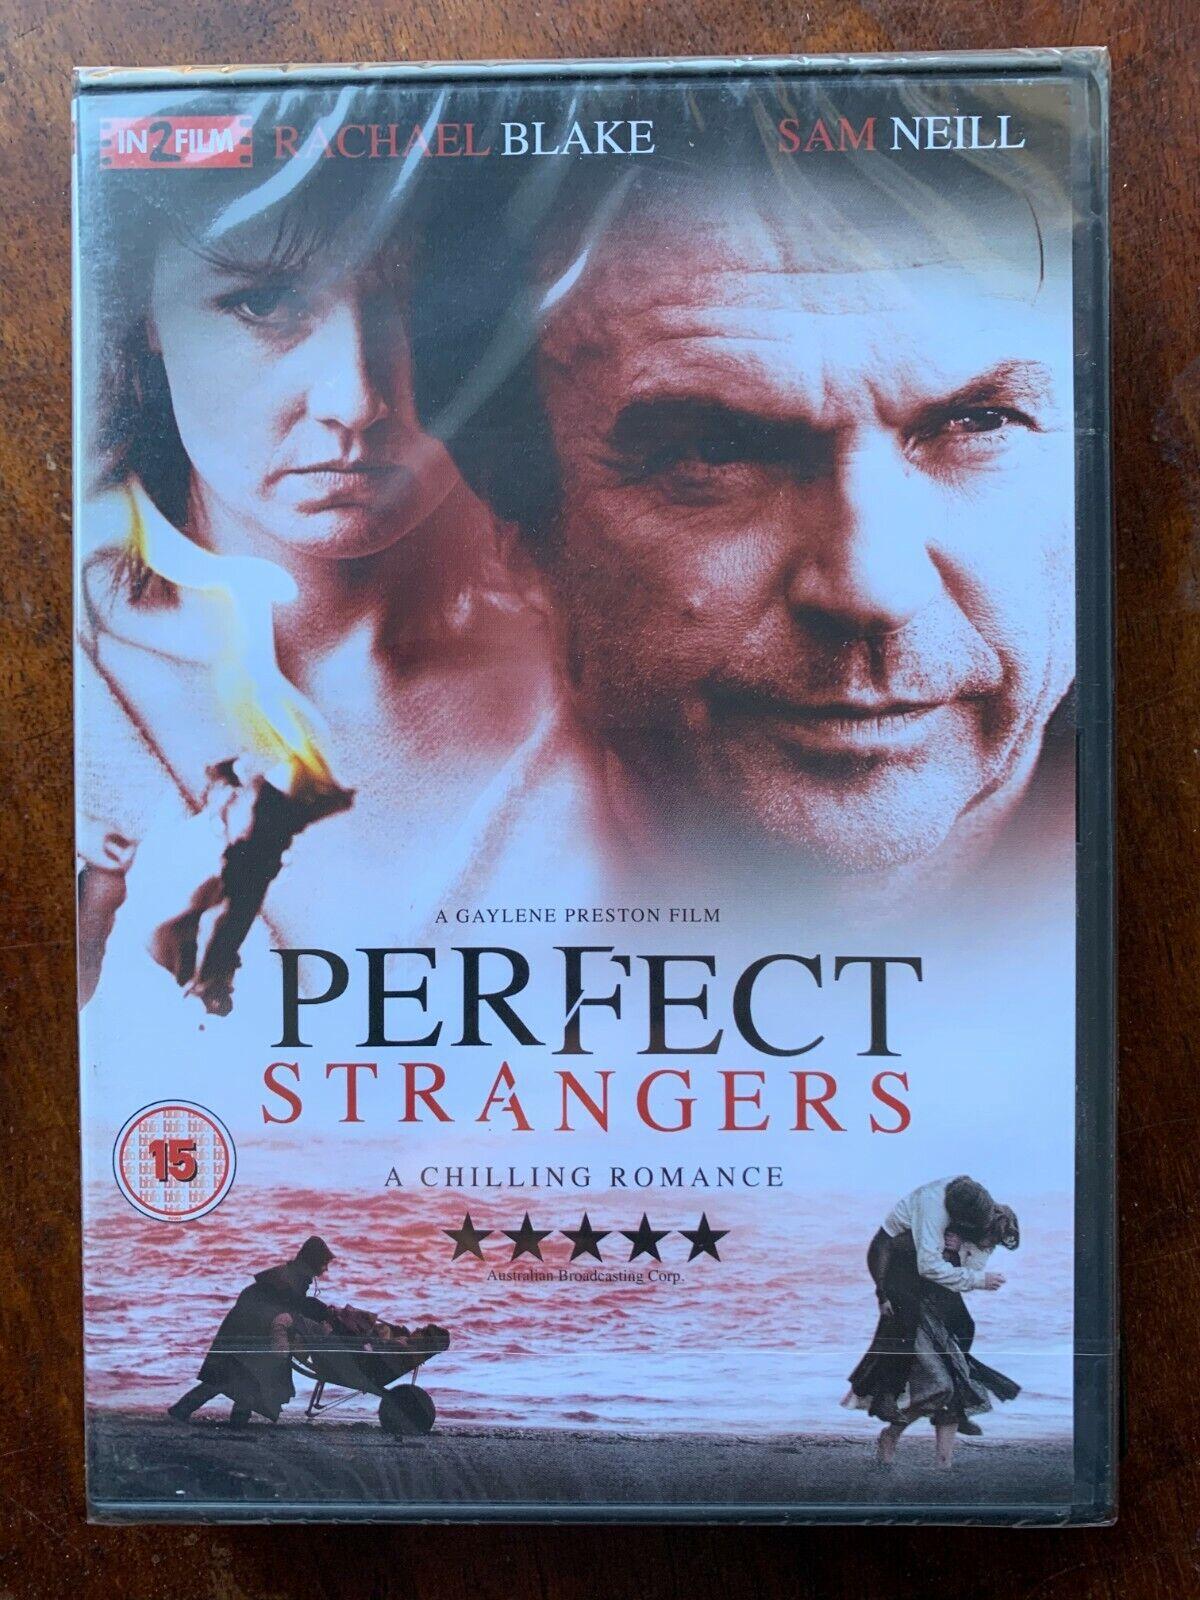 Sam Neill Rachael Blake Strangers 20 Zealand Drama UK DVD for ...